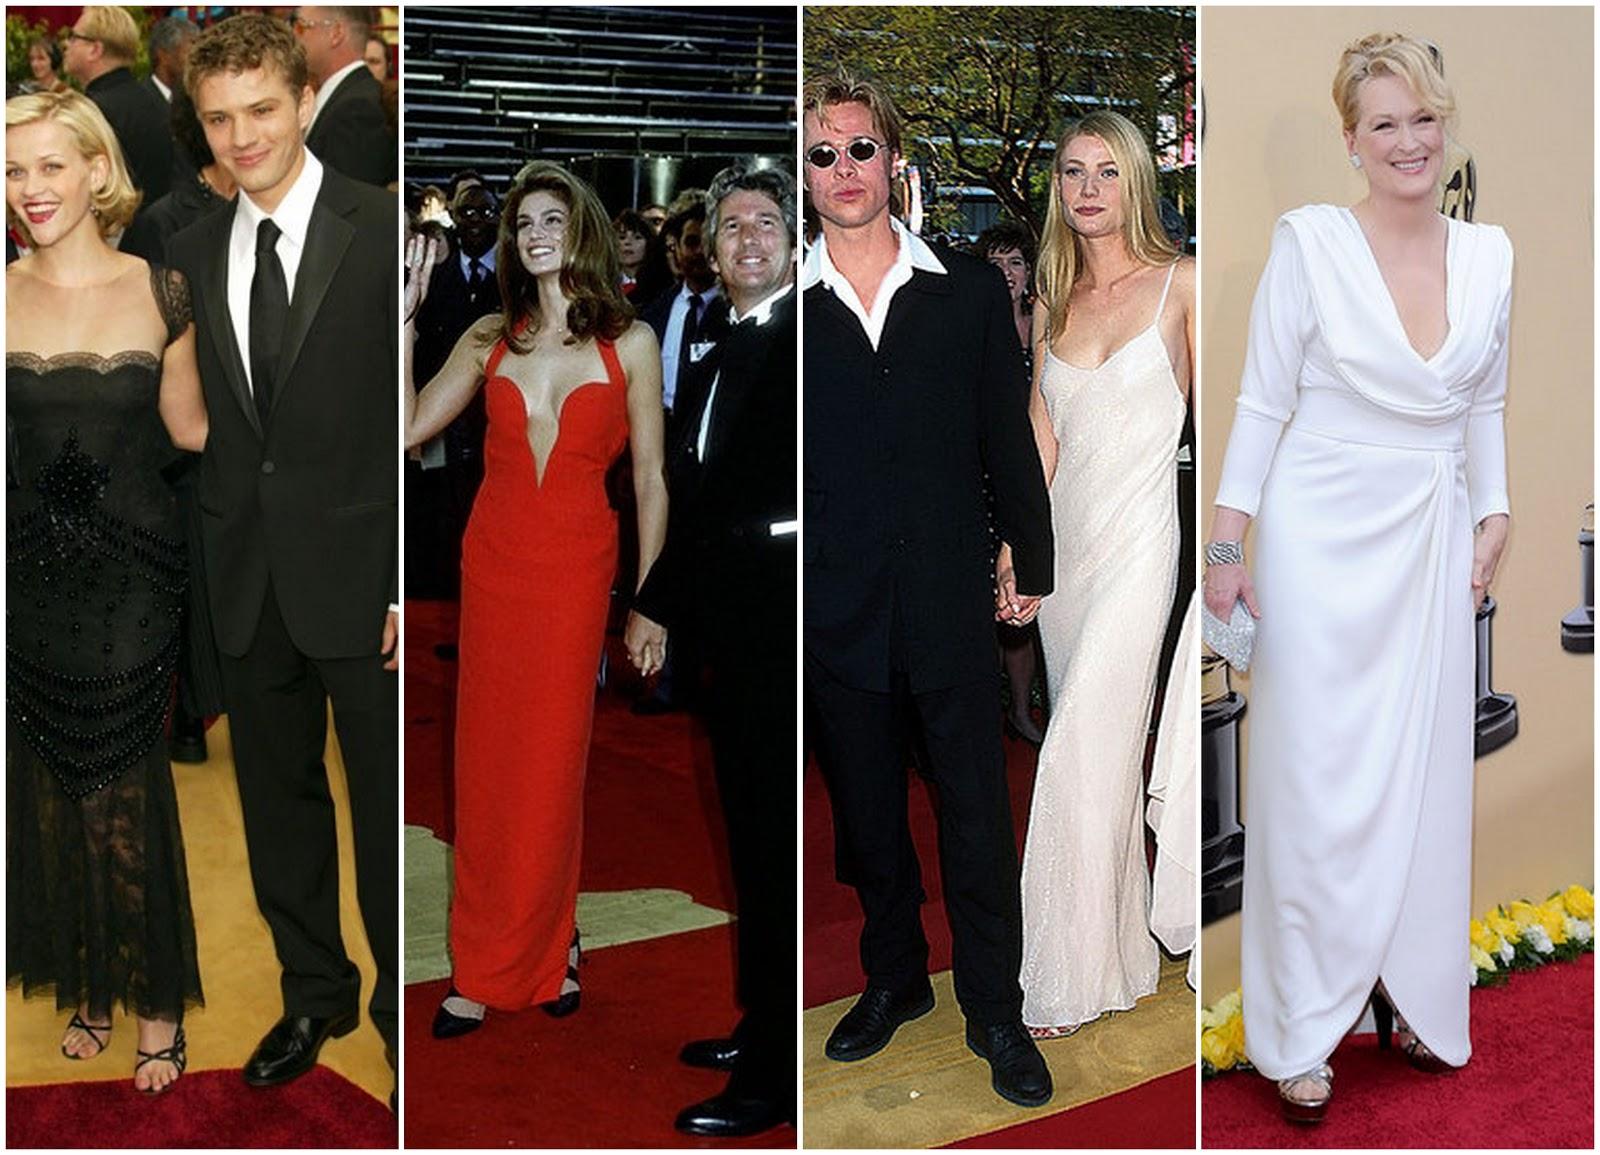 http://3.bp.blogspot.com/-x1BLHwvLhbQ/T0dkcD8UQTI/AAAAAAAACGU/vEmdfCNoo-s/s1600/COLUMN+DRESS3.jpg